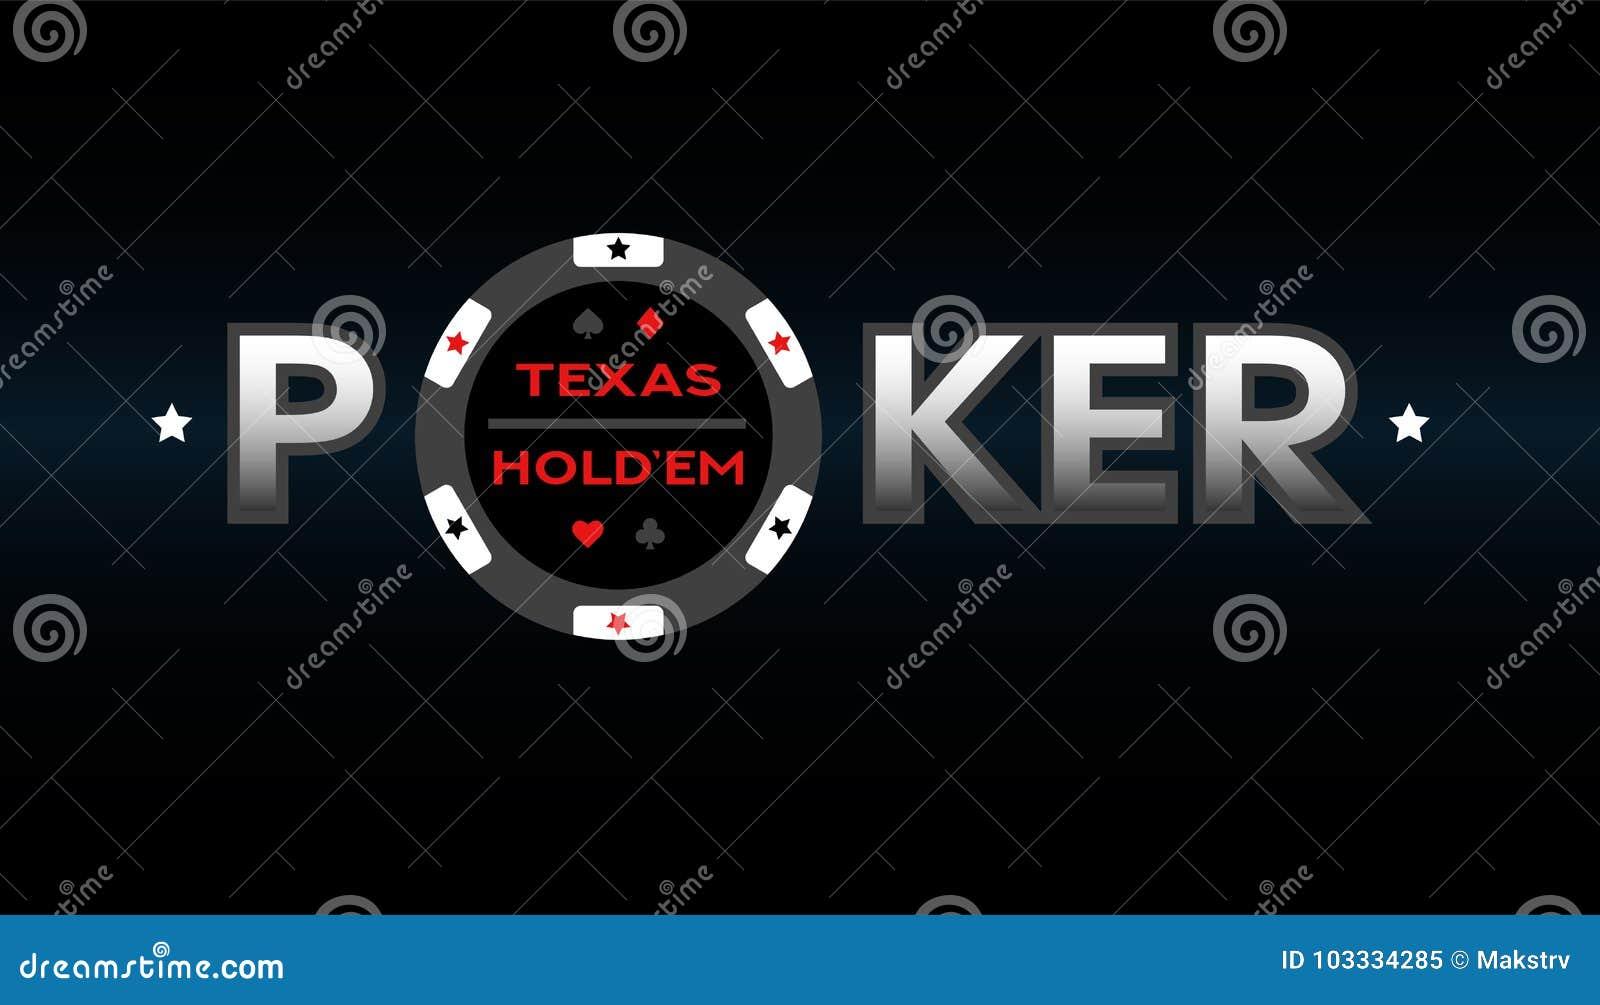 Texas Holdem Poker Vector Illustration Stock Vector Illustration Of Luck Chip 103334285